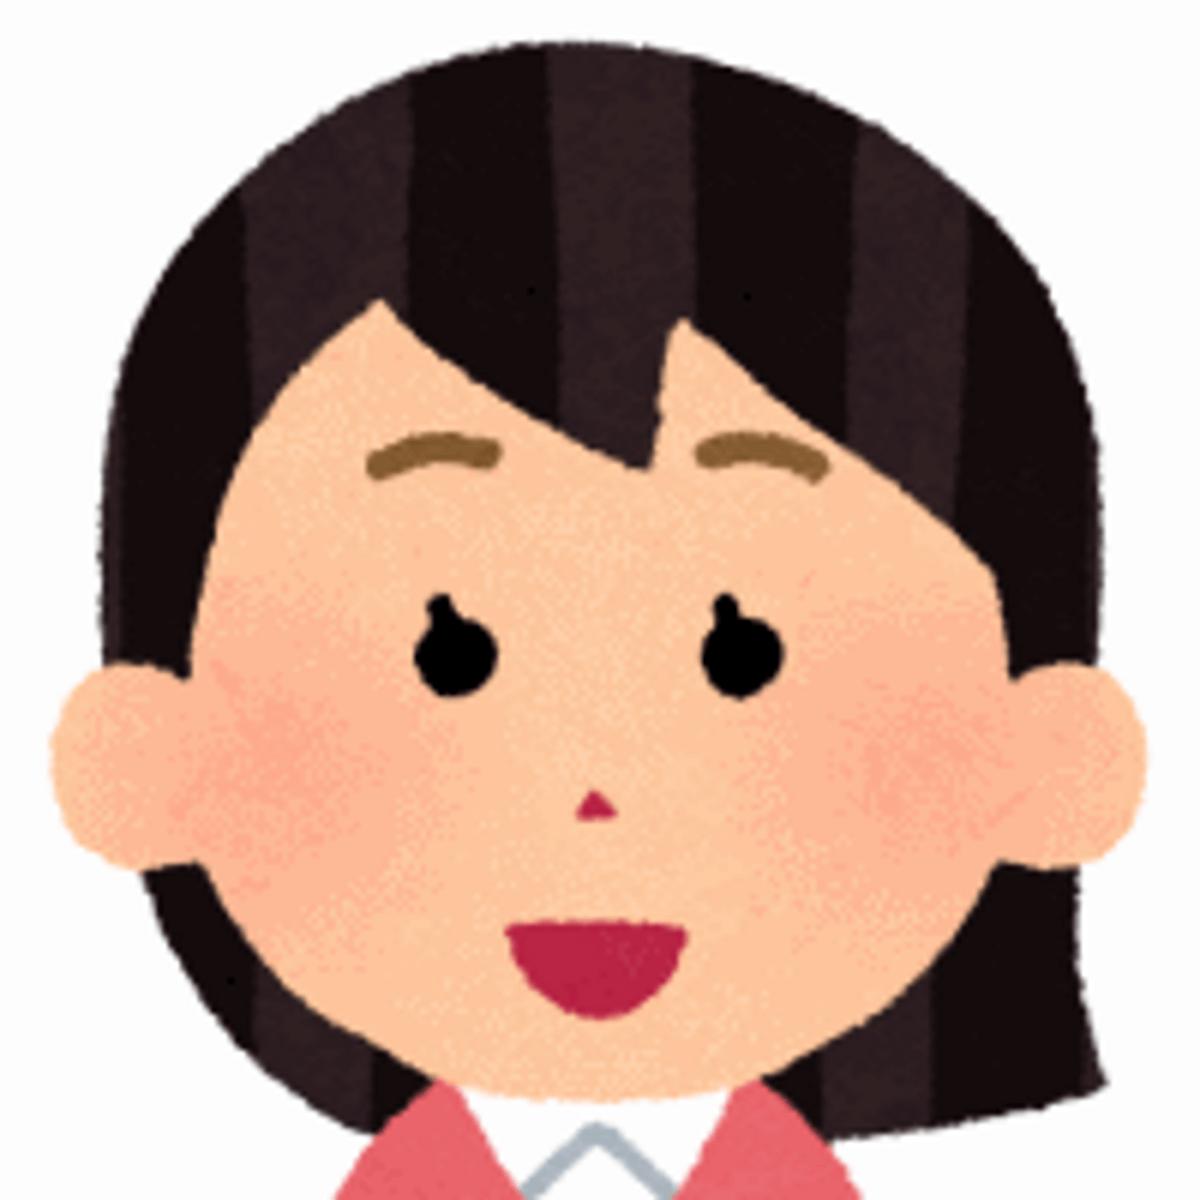 J子さん:神奈川県30代女性のイラスト